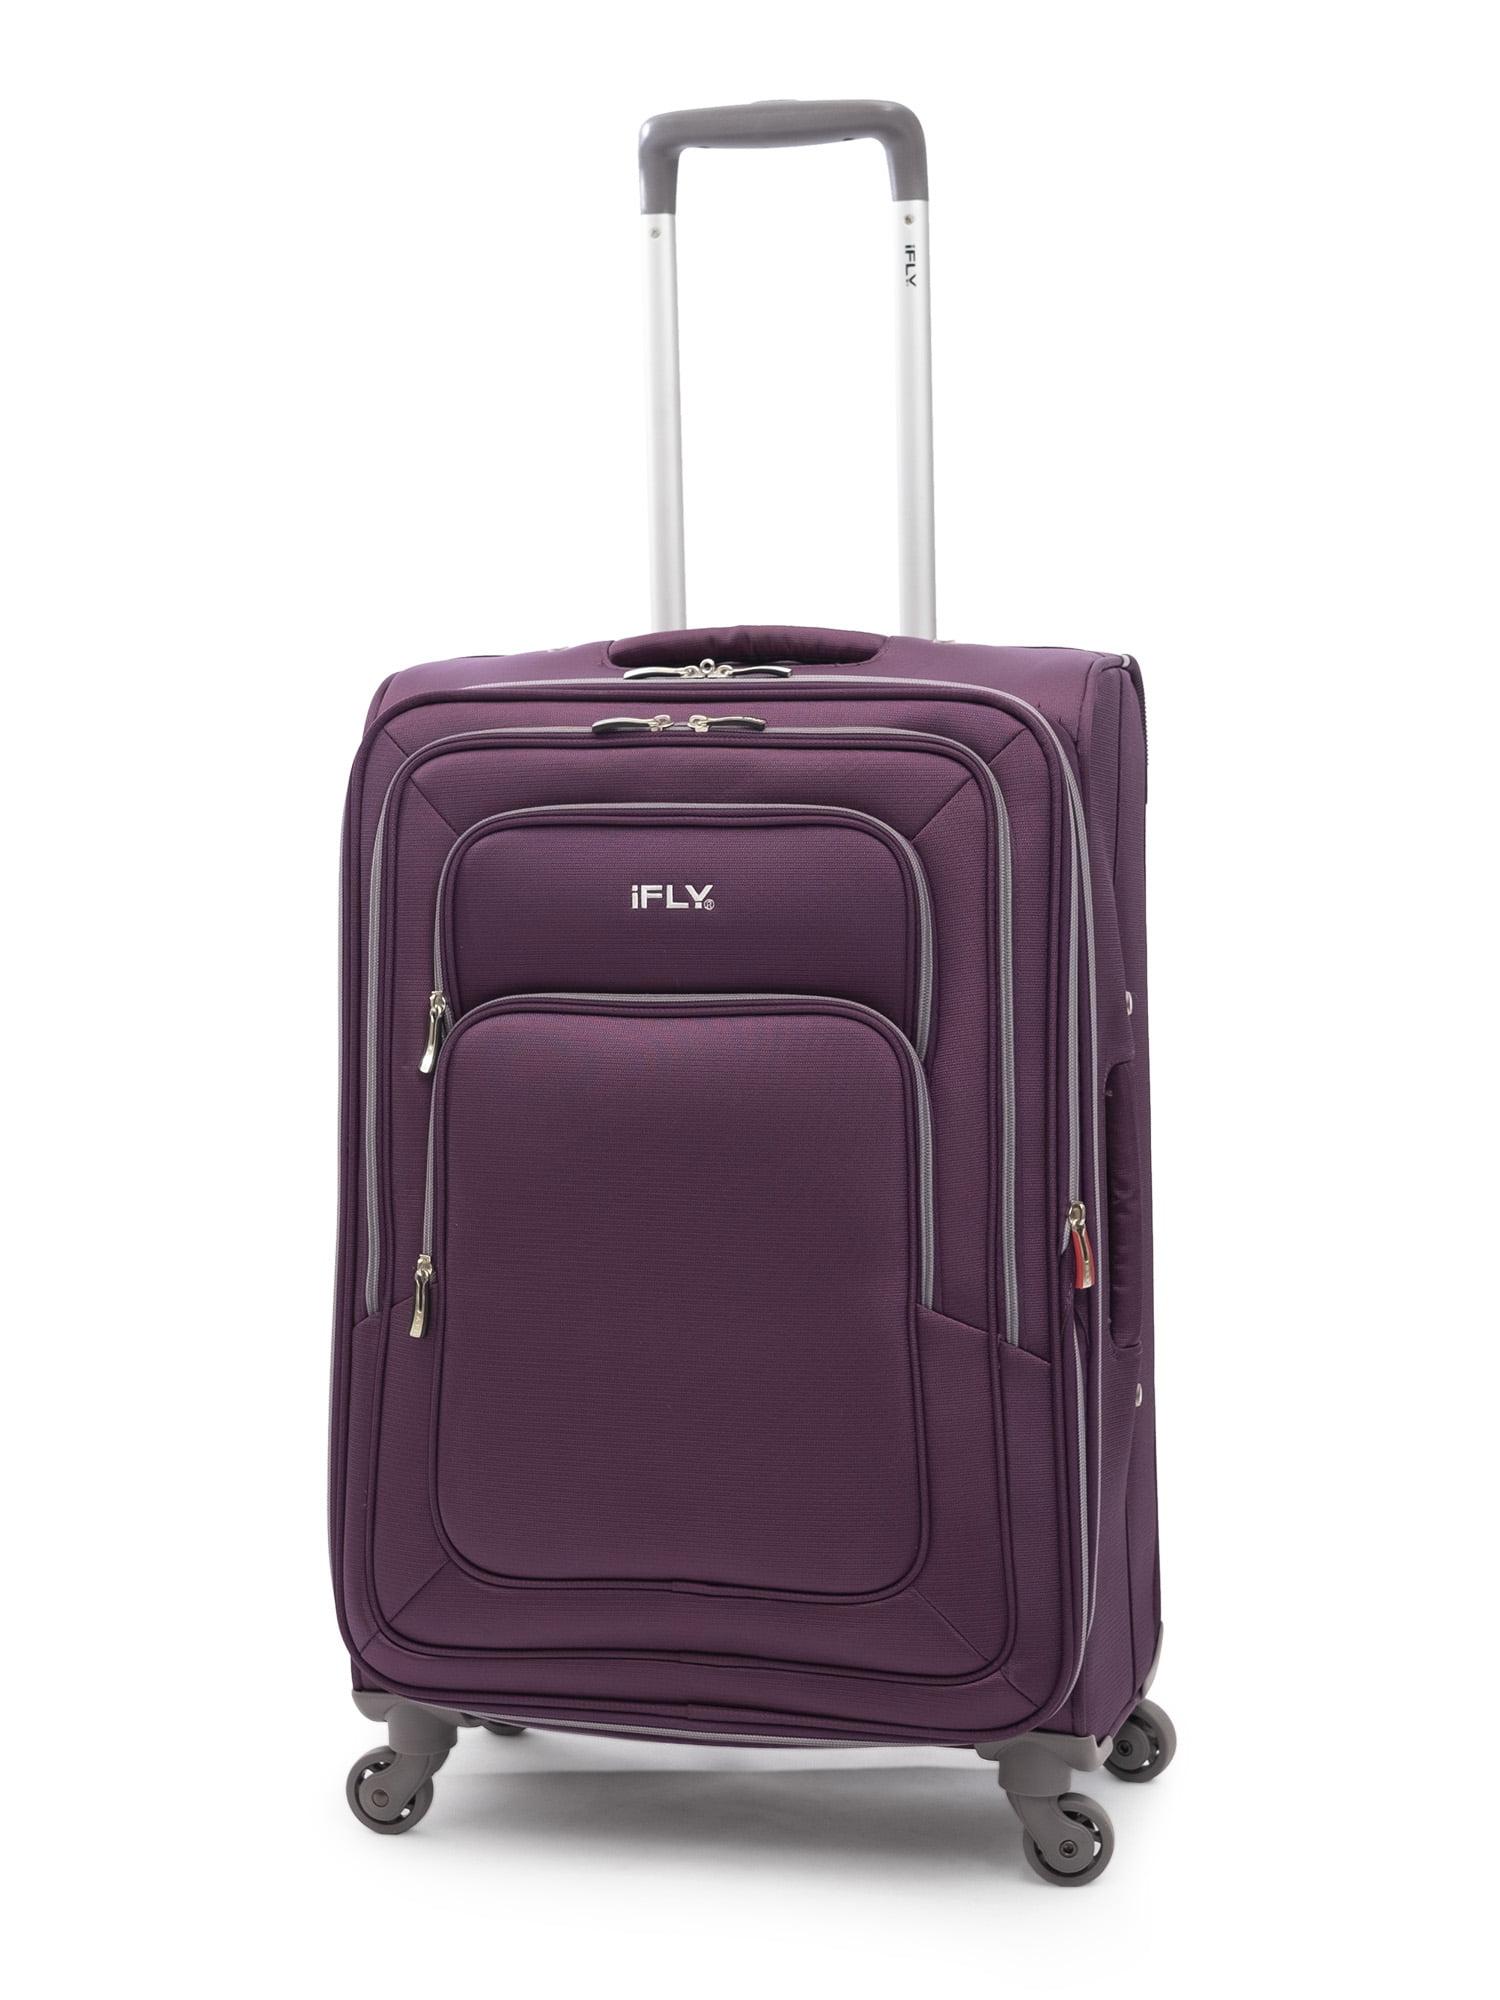 "iFLY Softside Luggage Jewel 24"", Purple"